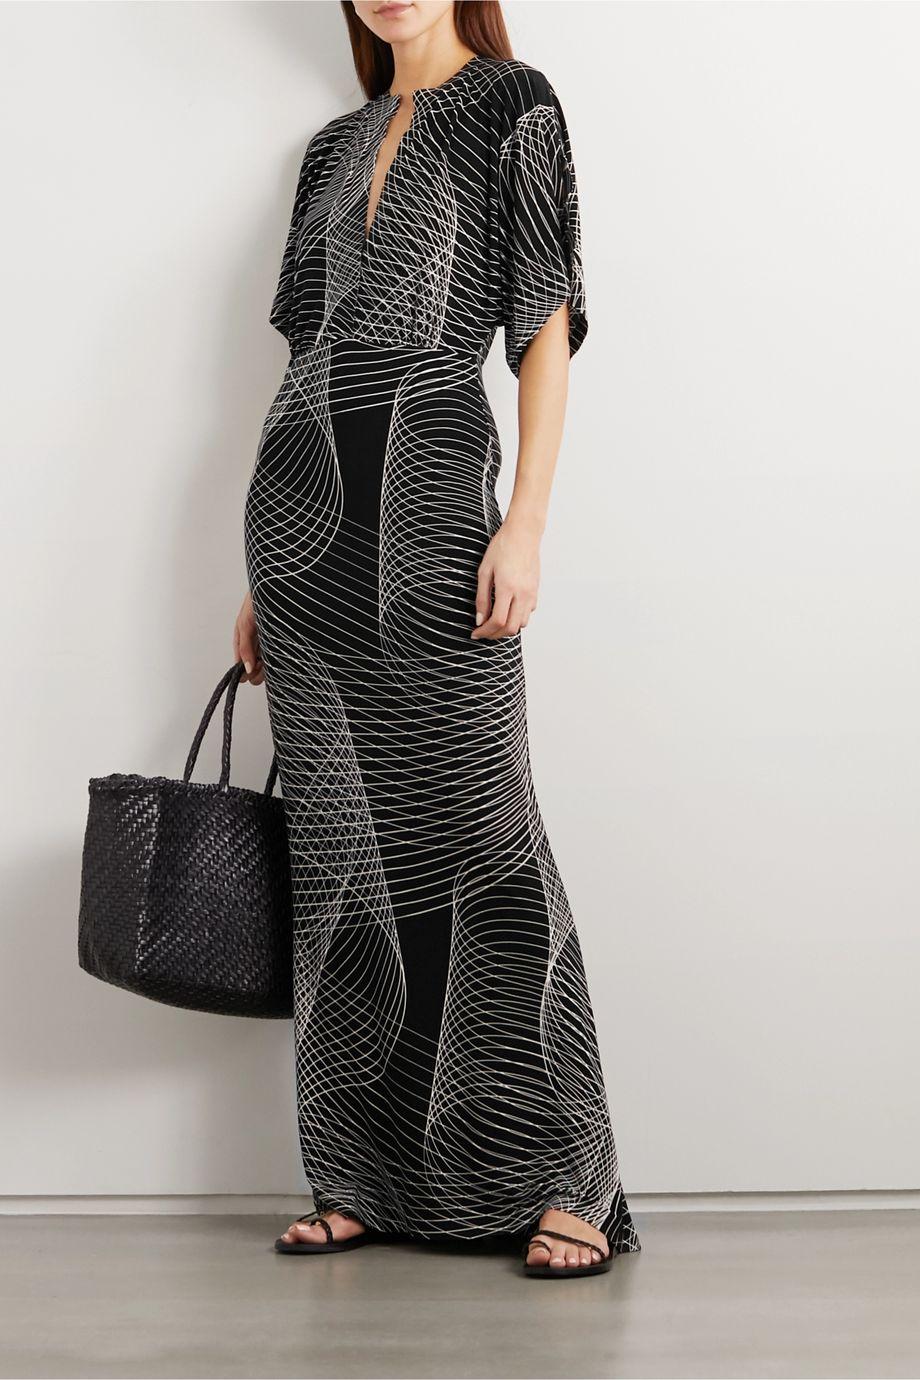 Norma Kamali Obie printed stretch-jersey maxi dress